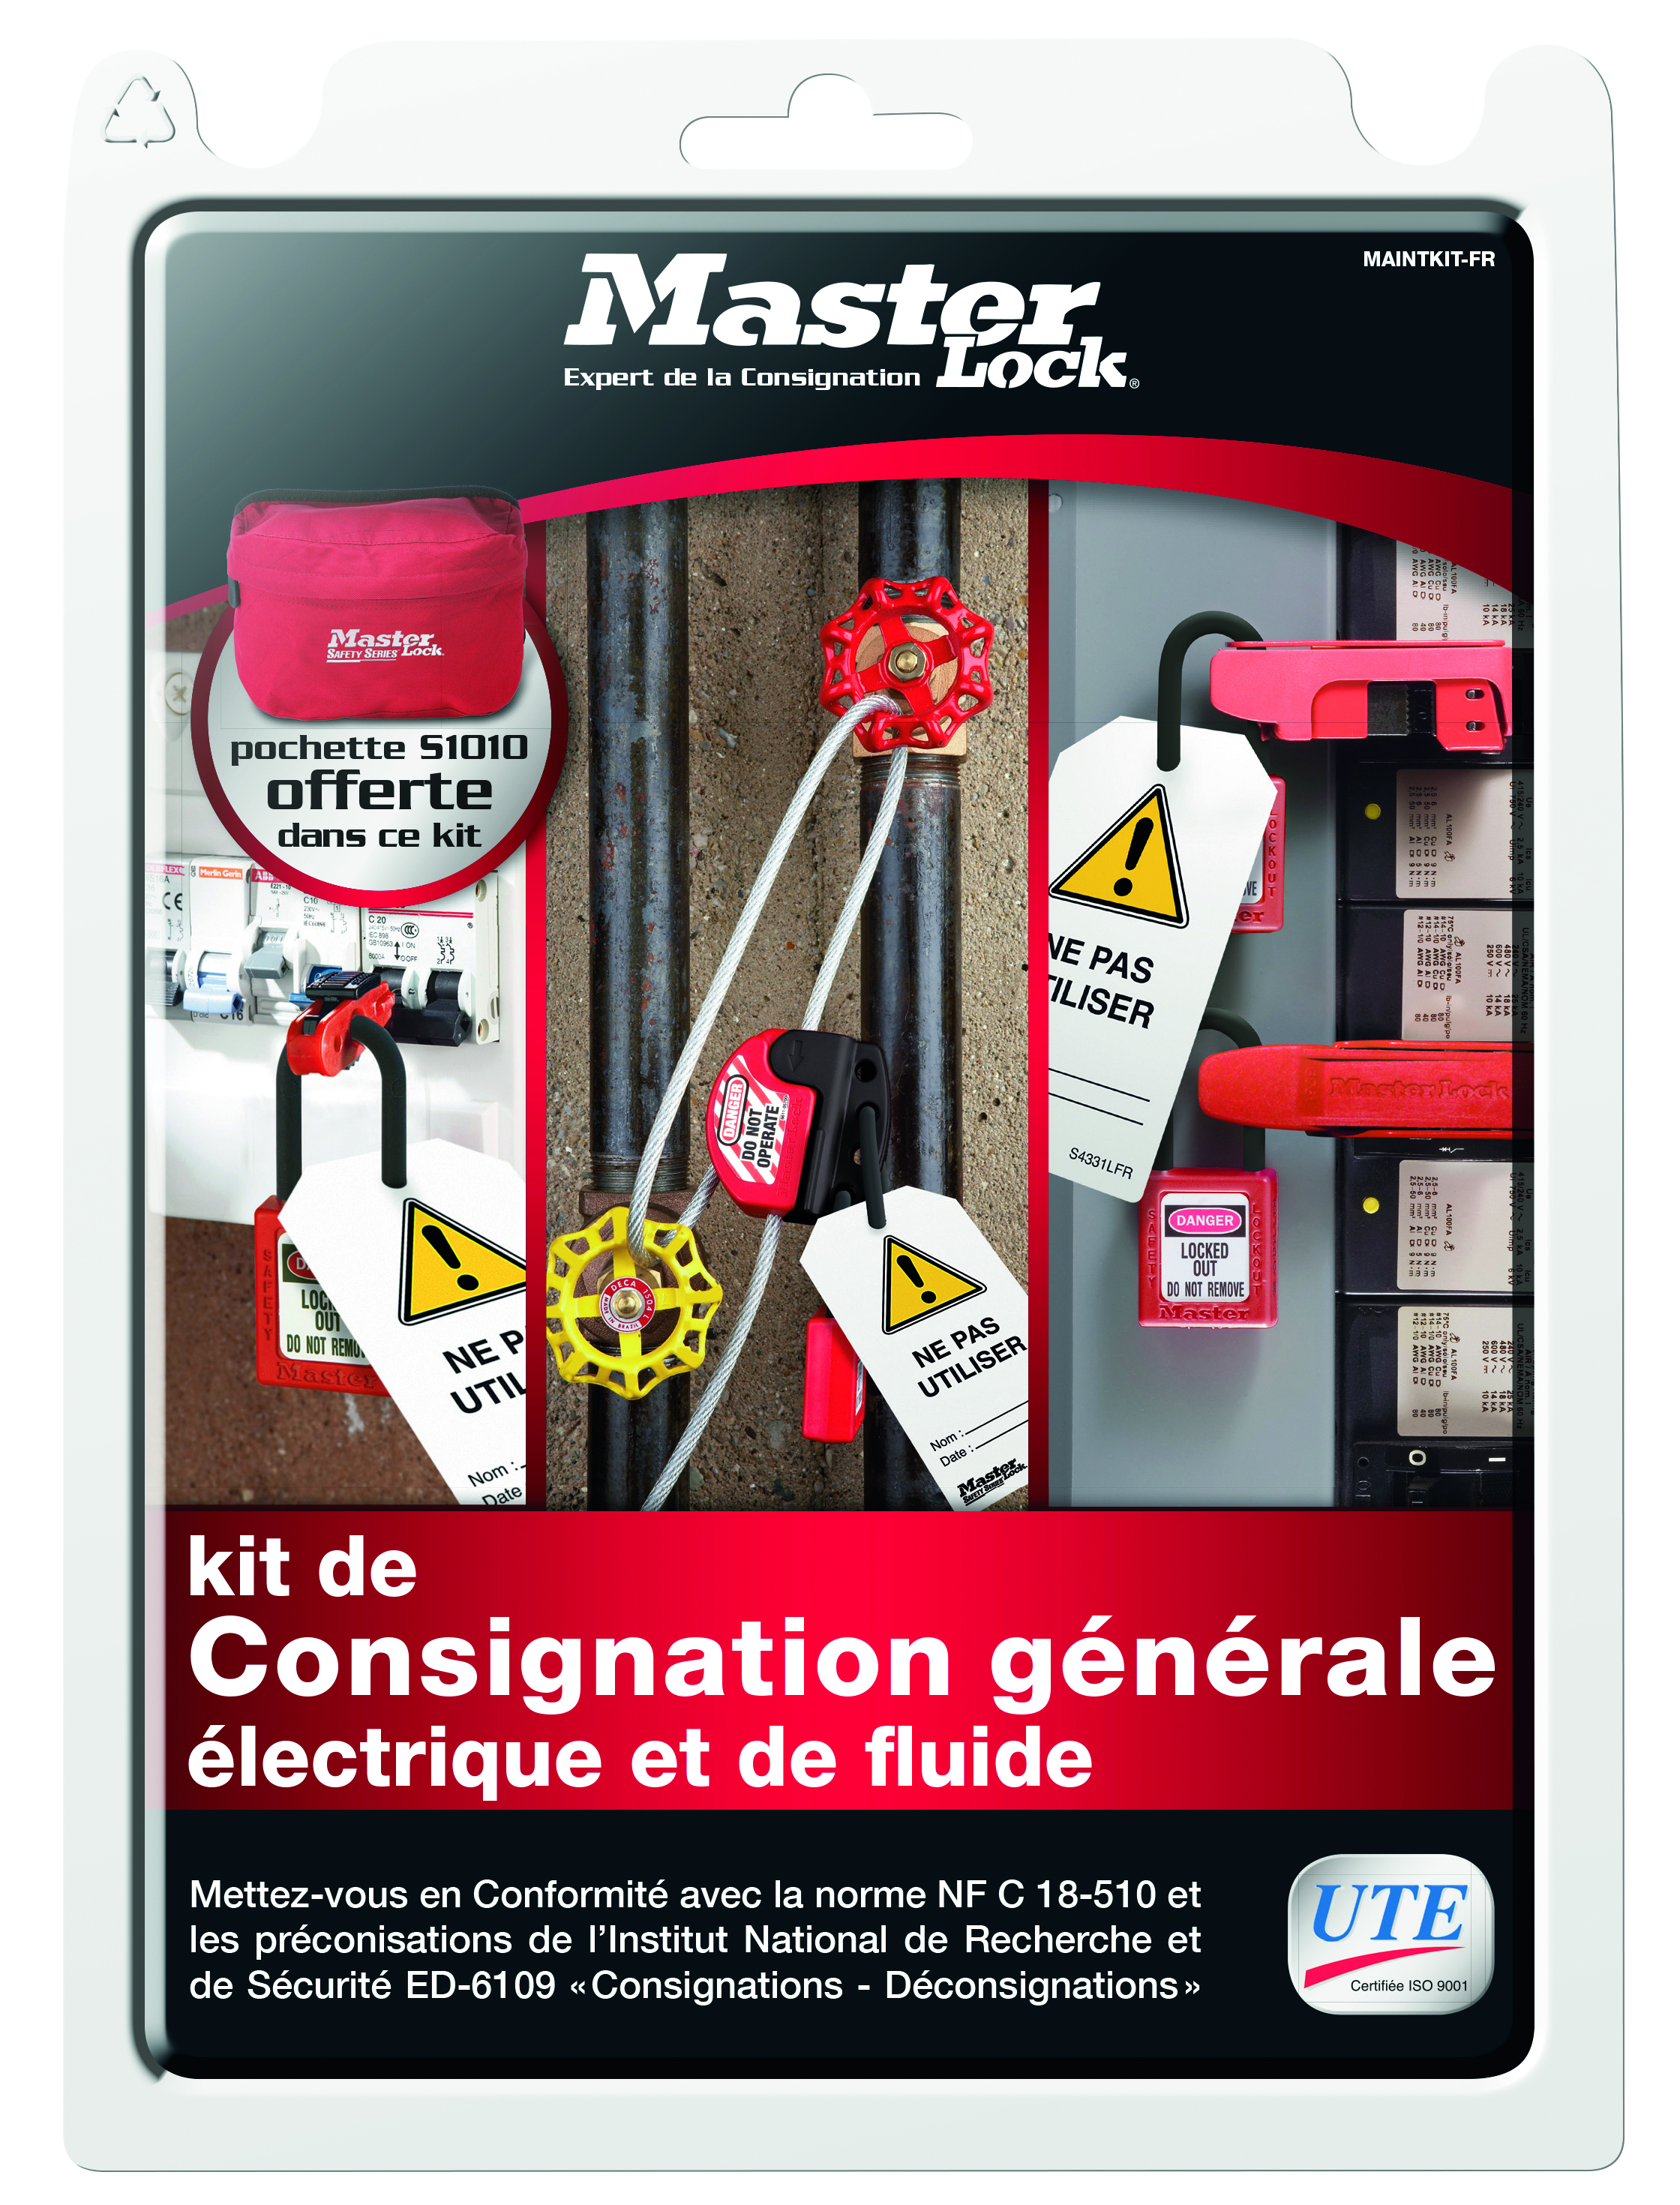 Master Lock Set Maintkit-FR